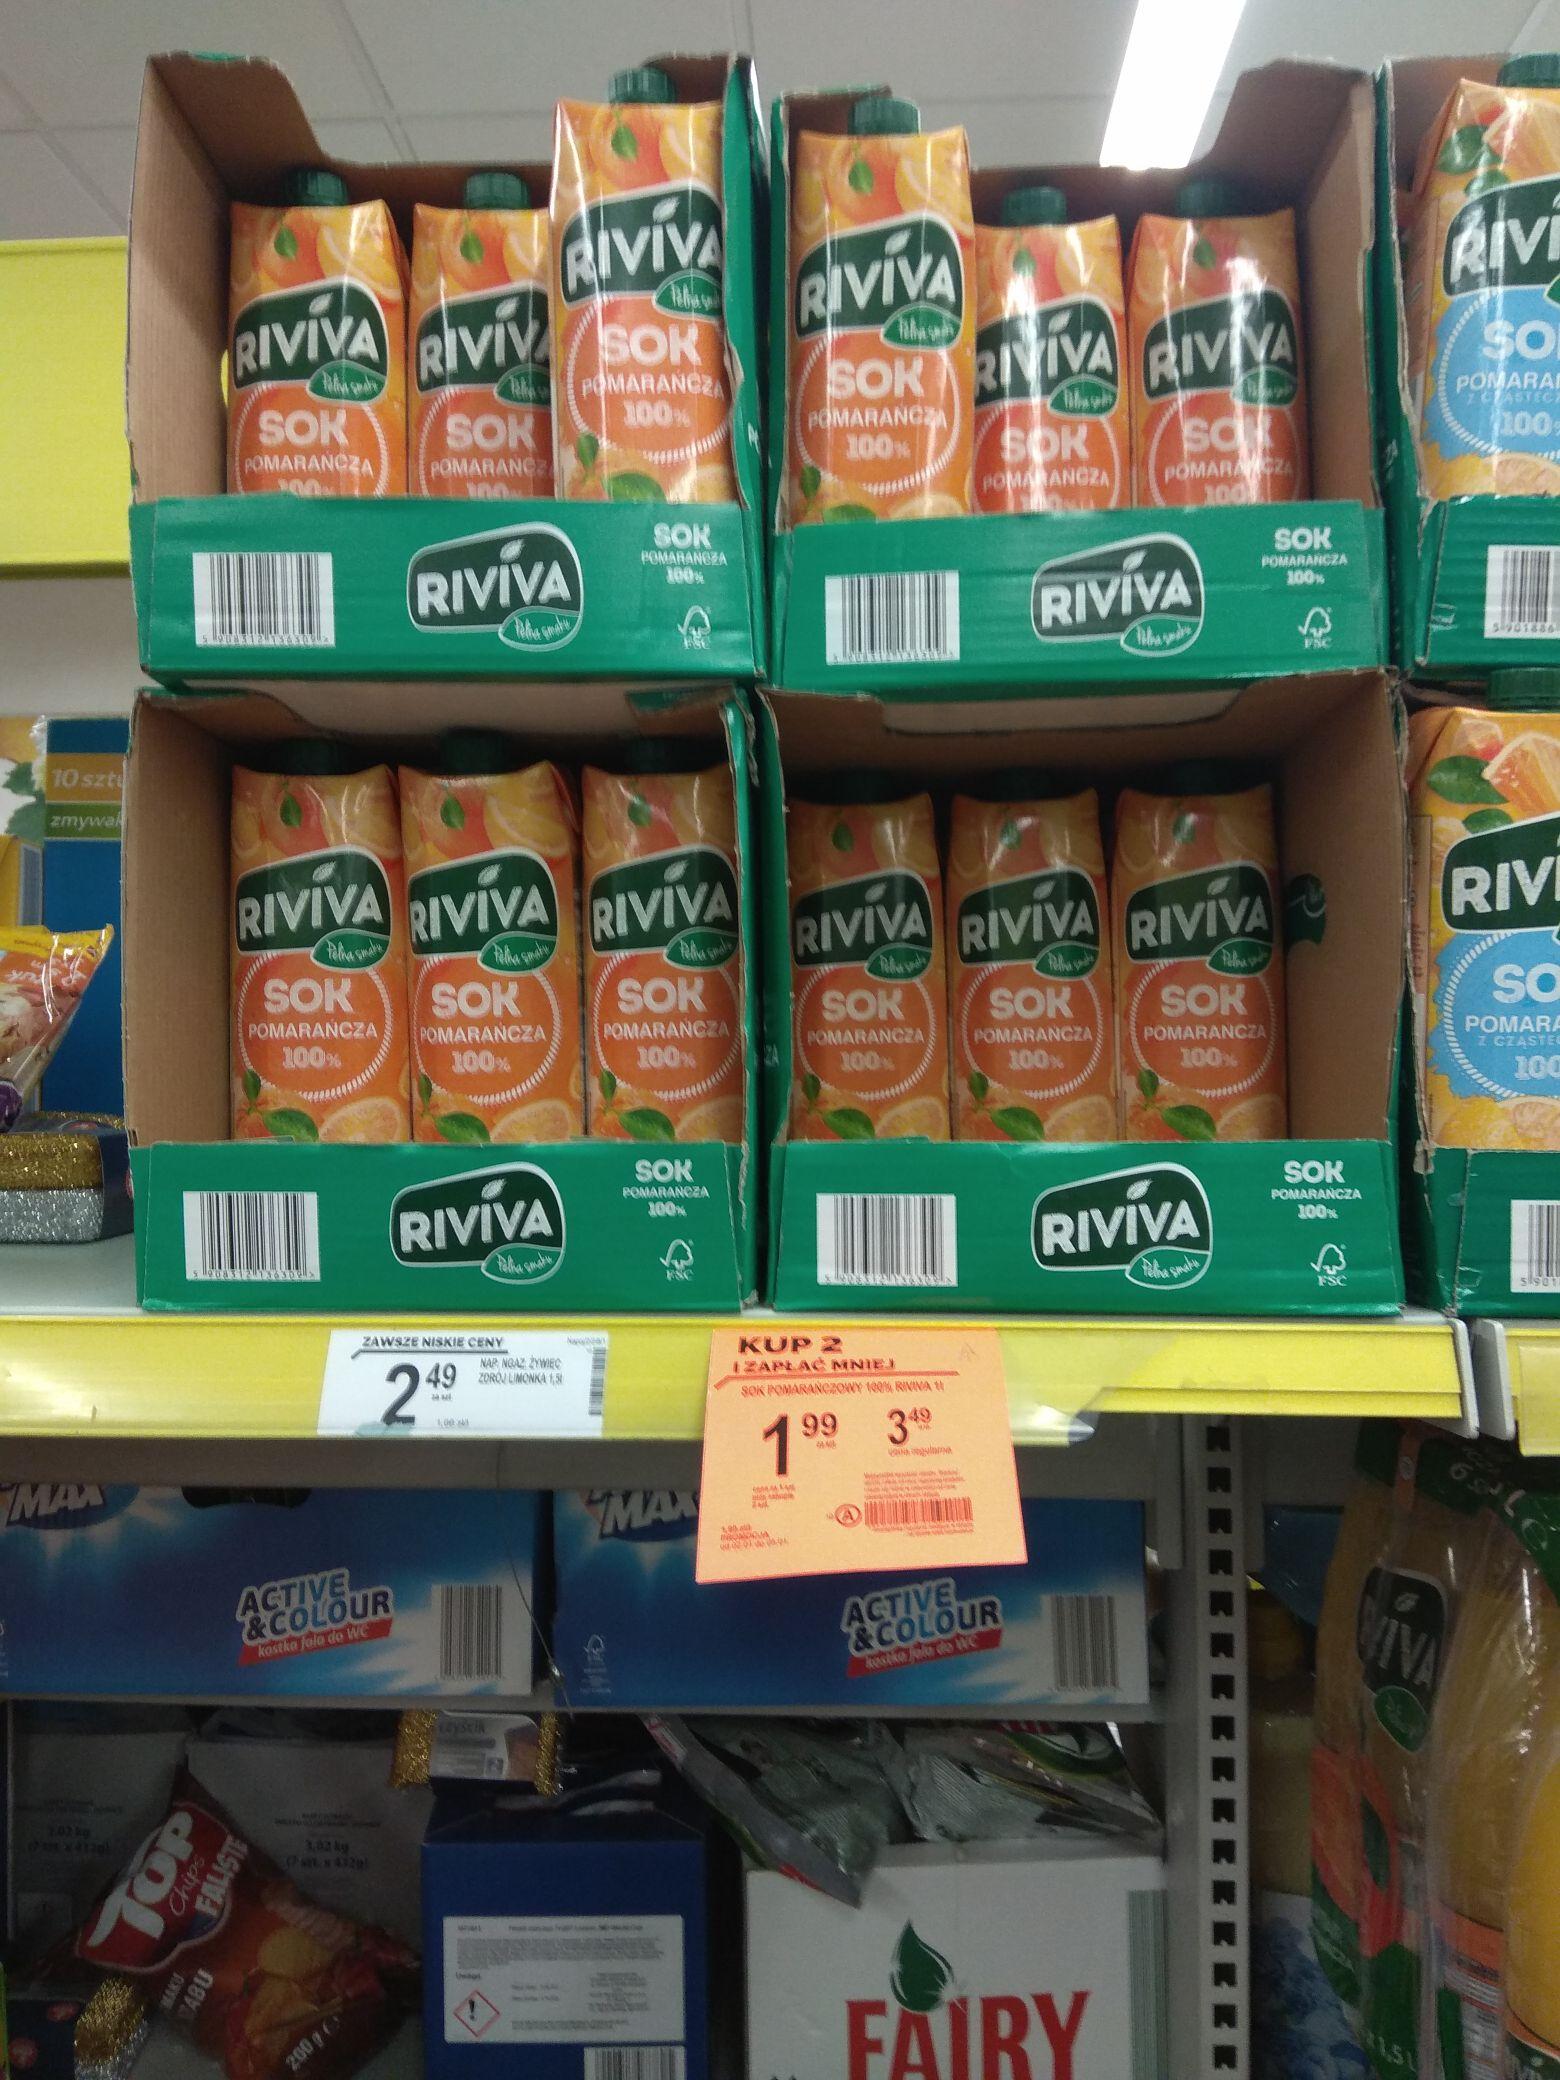 Sok pomarańczowy 100% 1litr Riviva - Biedronka